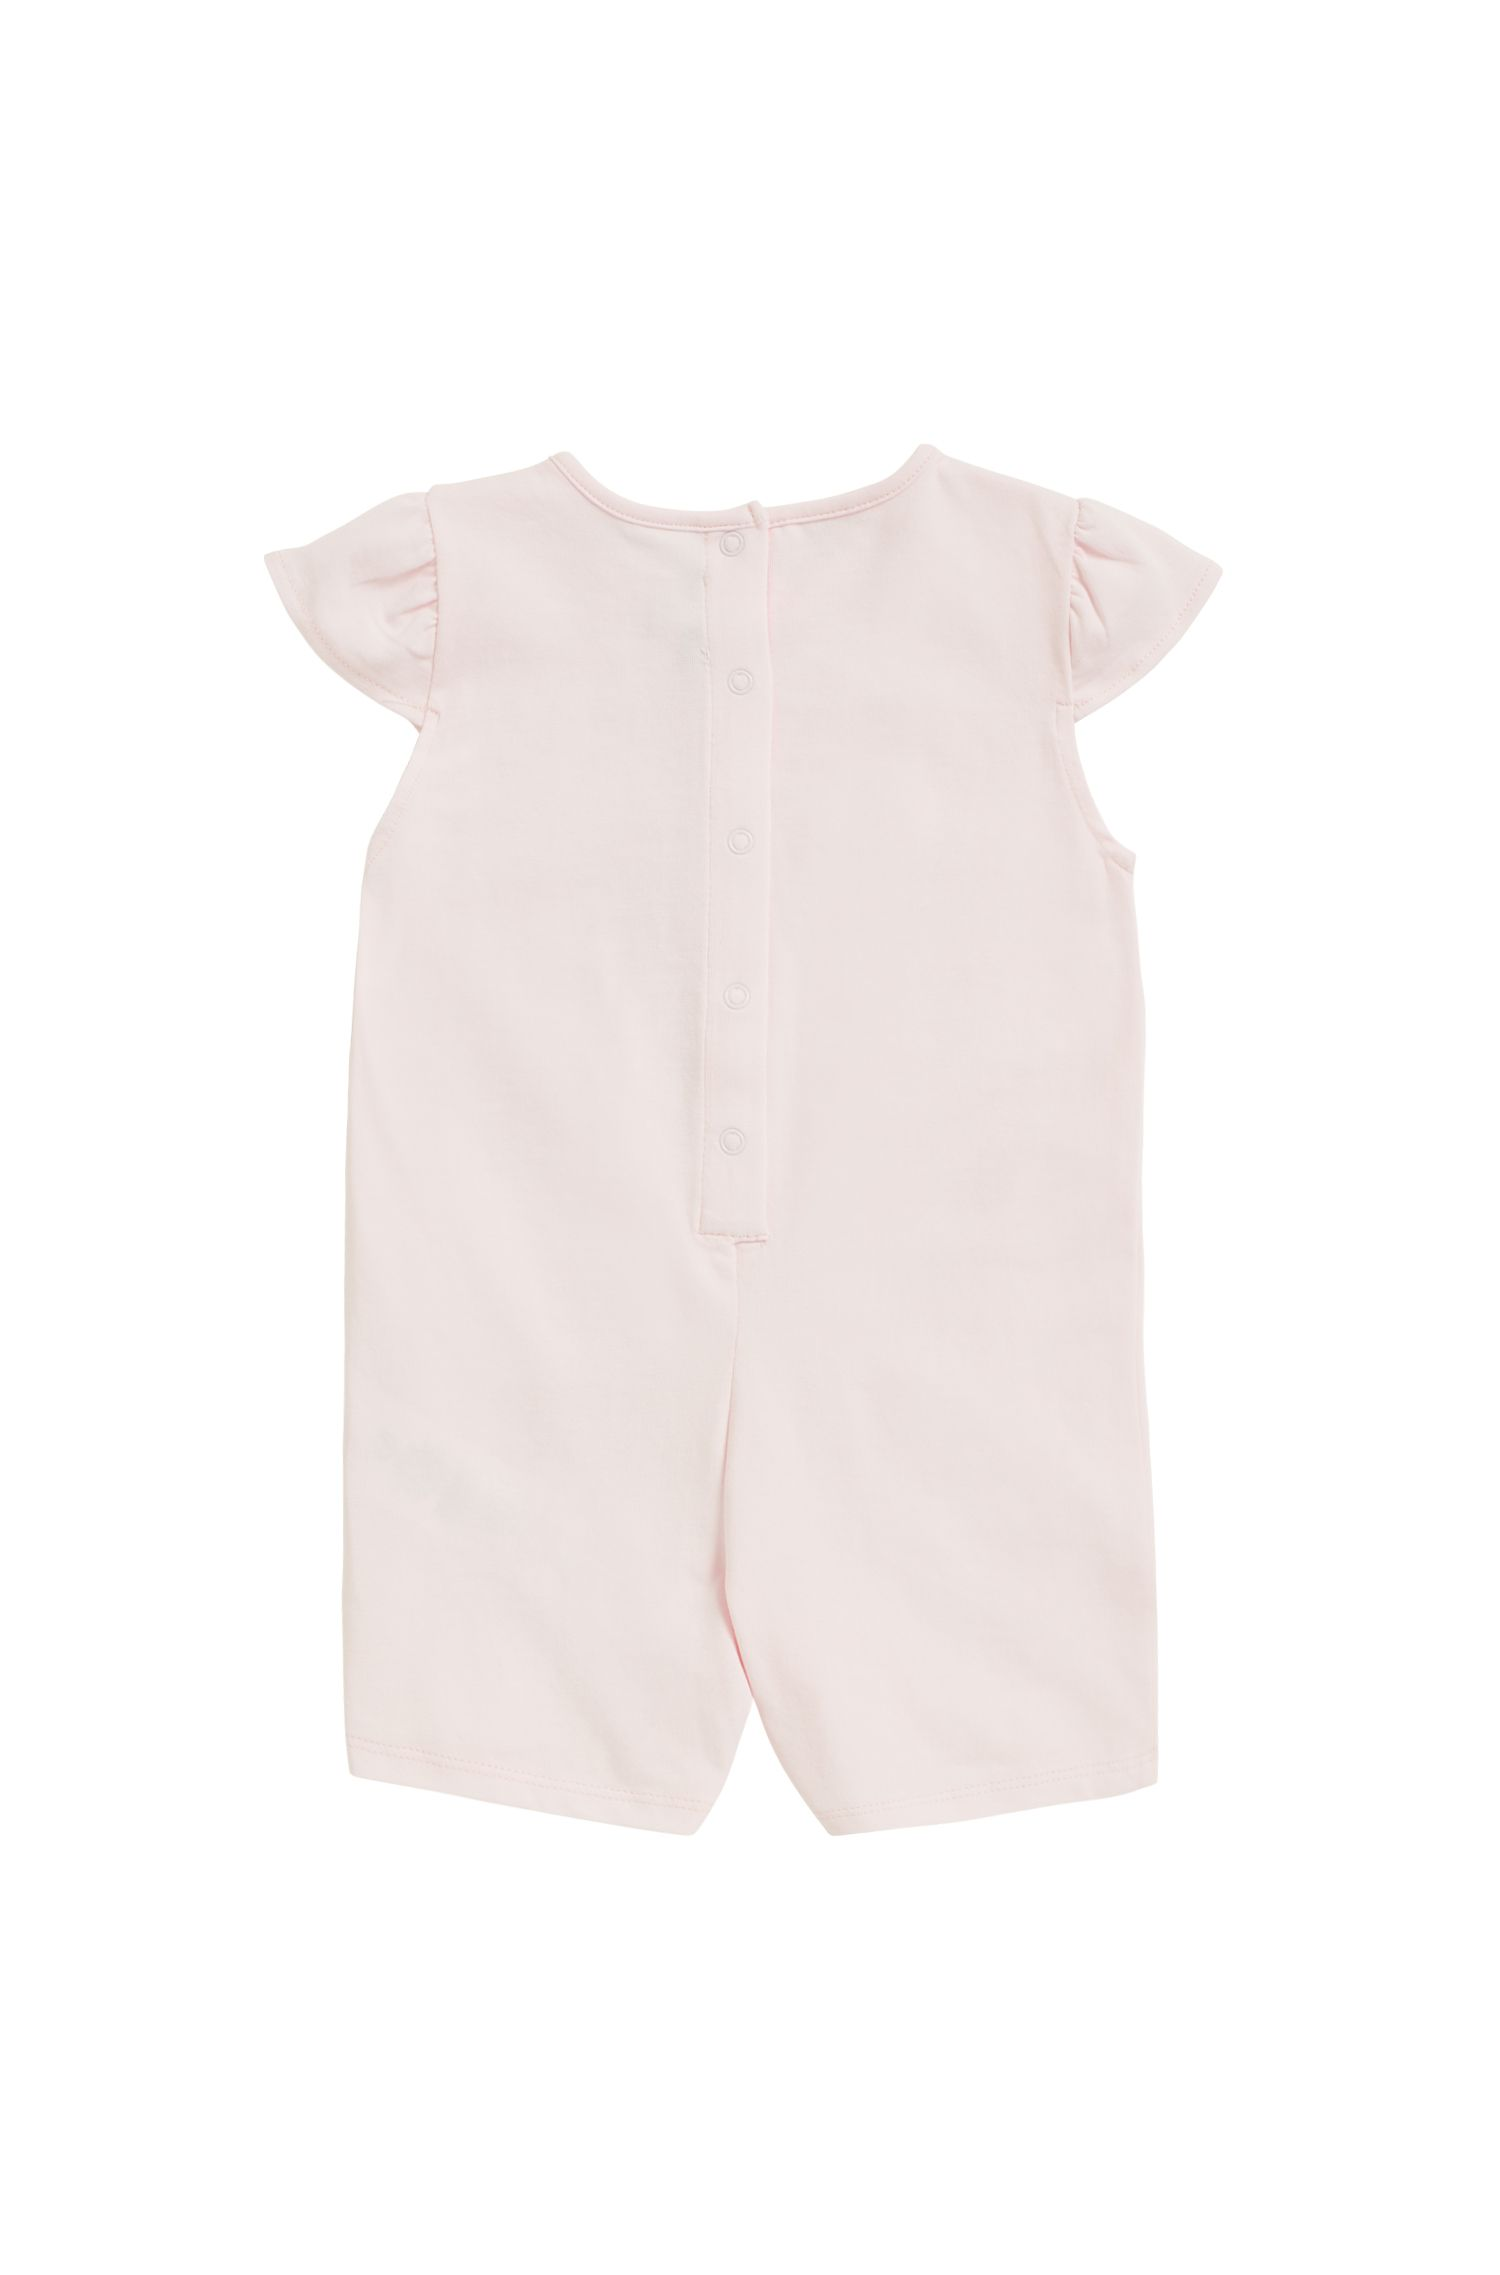 Baby-Jumpsuit aus elastischer Baumwolle in Schimmer-Optik, Hellrosa